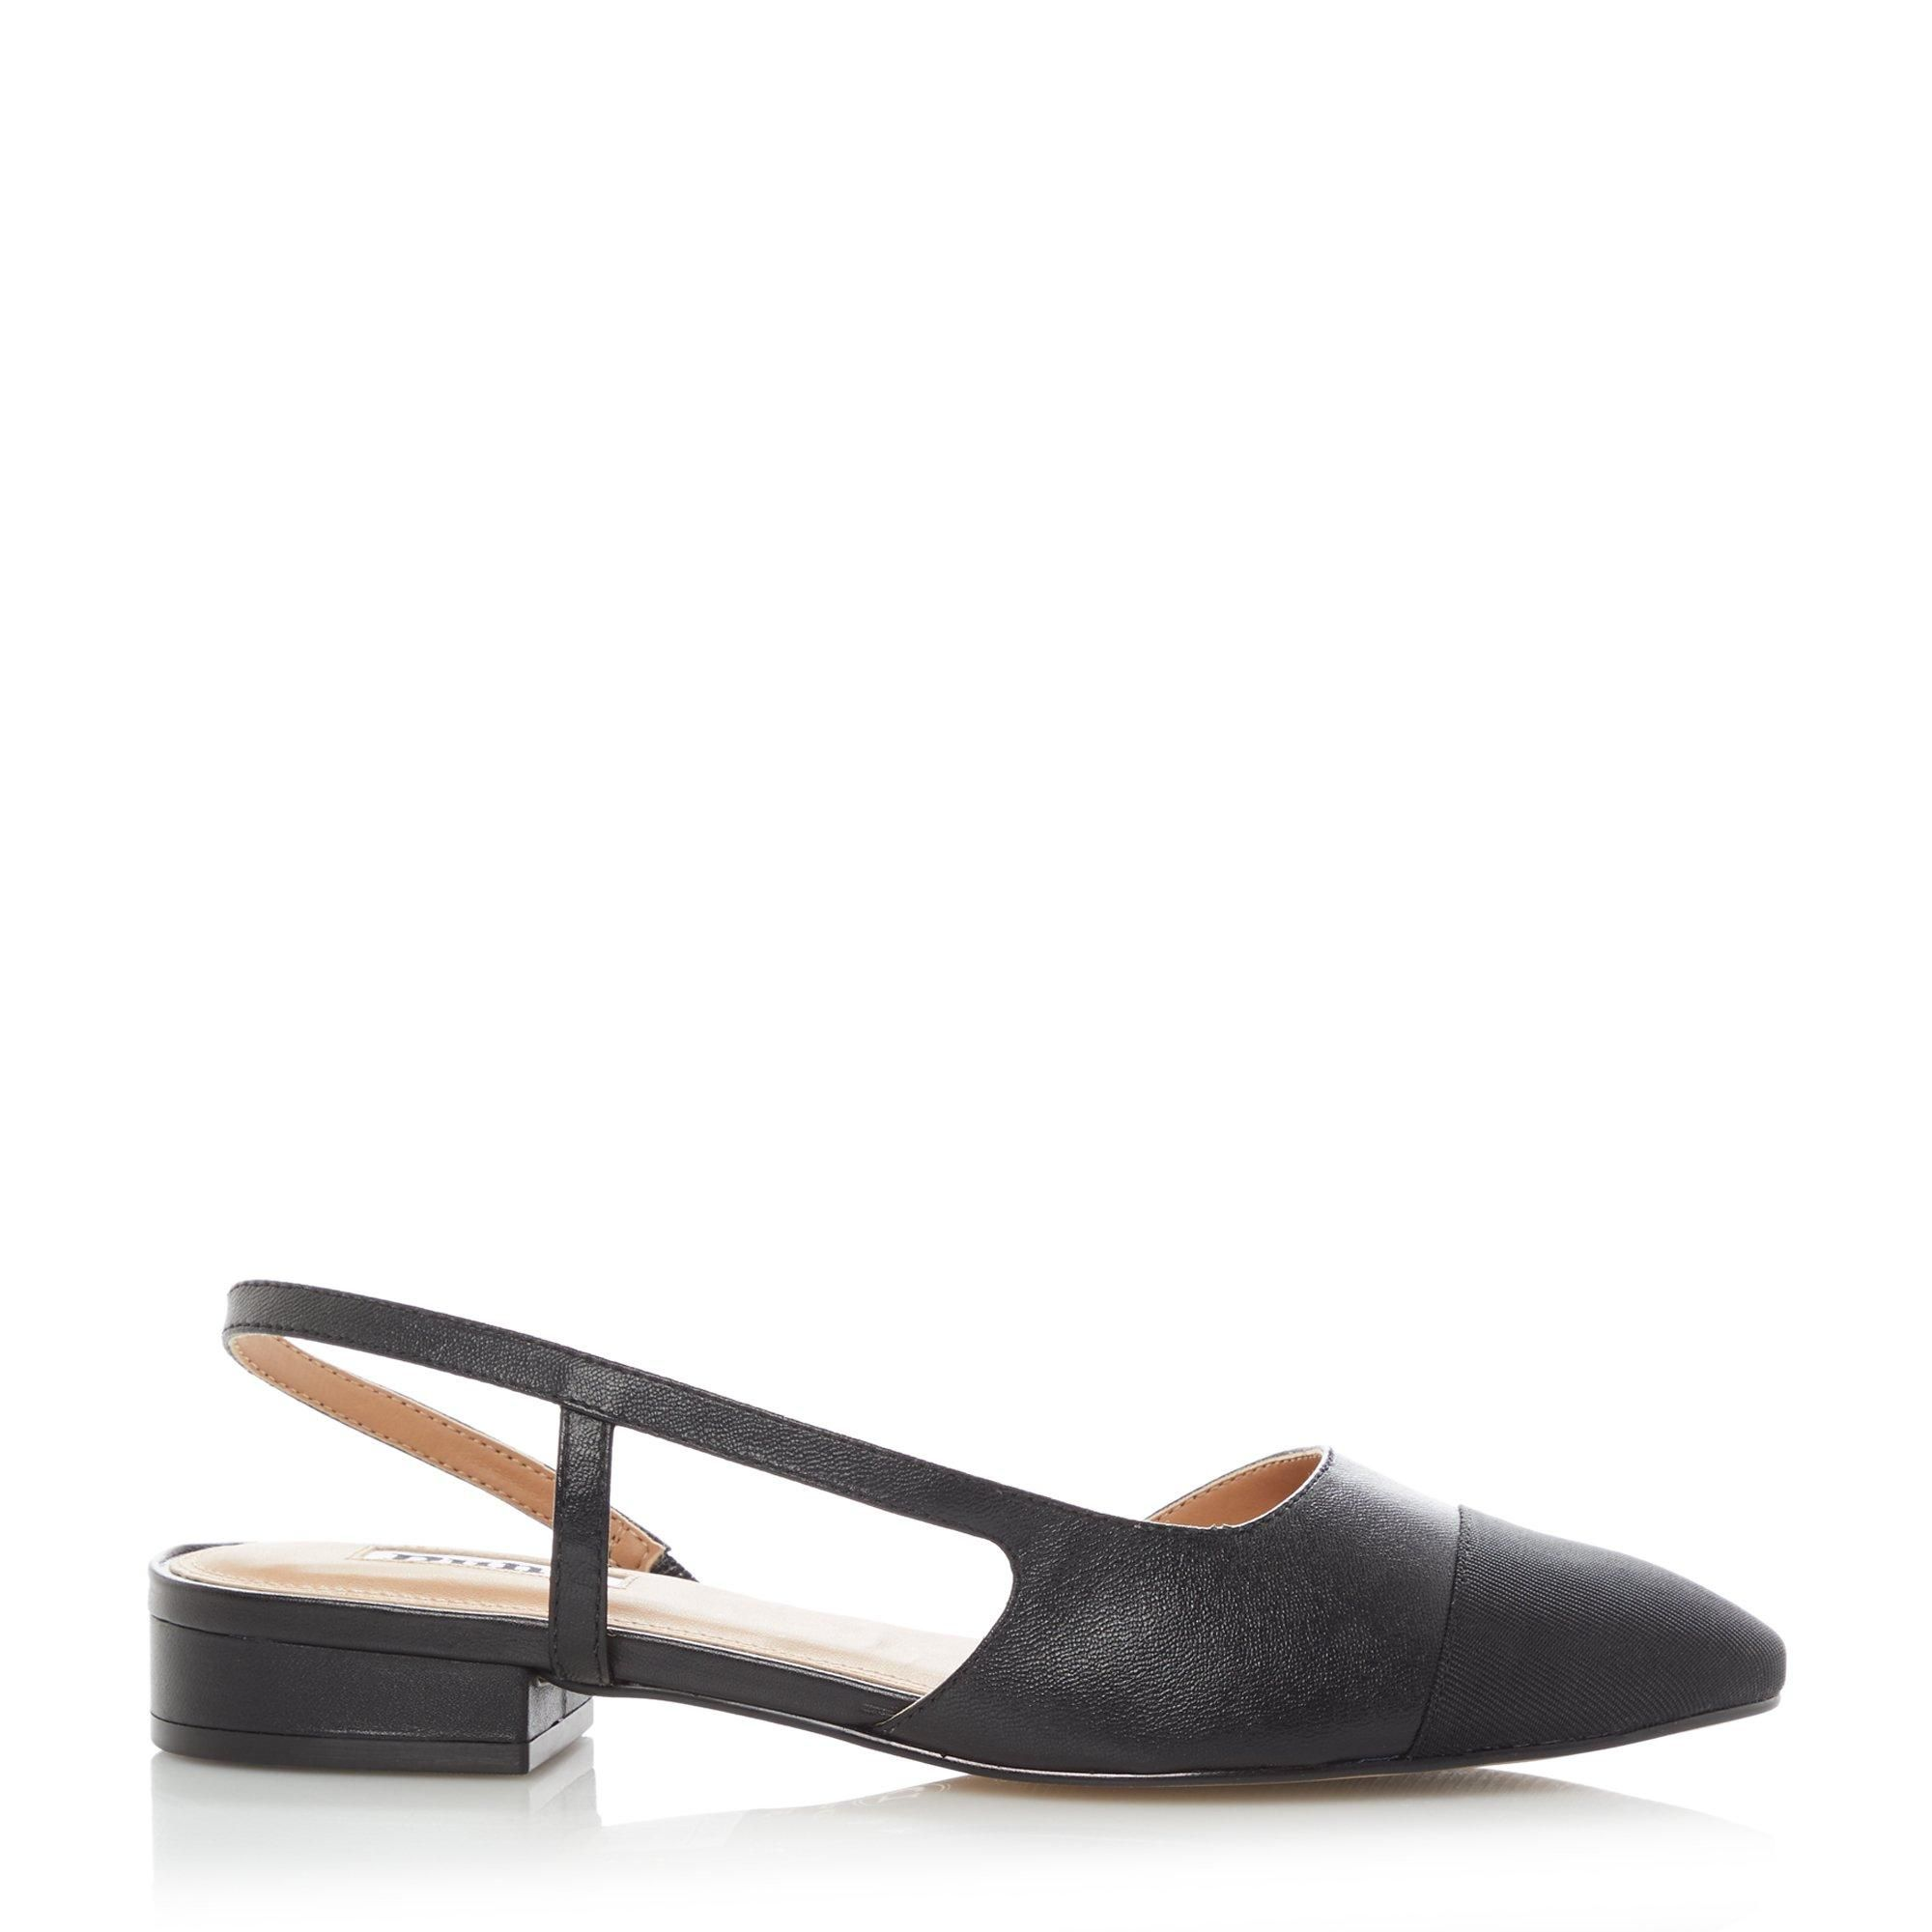 Dune Ladies CORALLINA  Block Heel Slingback Shoes